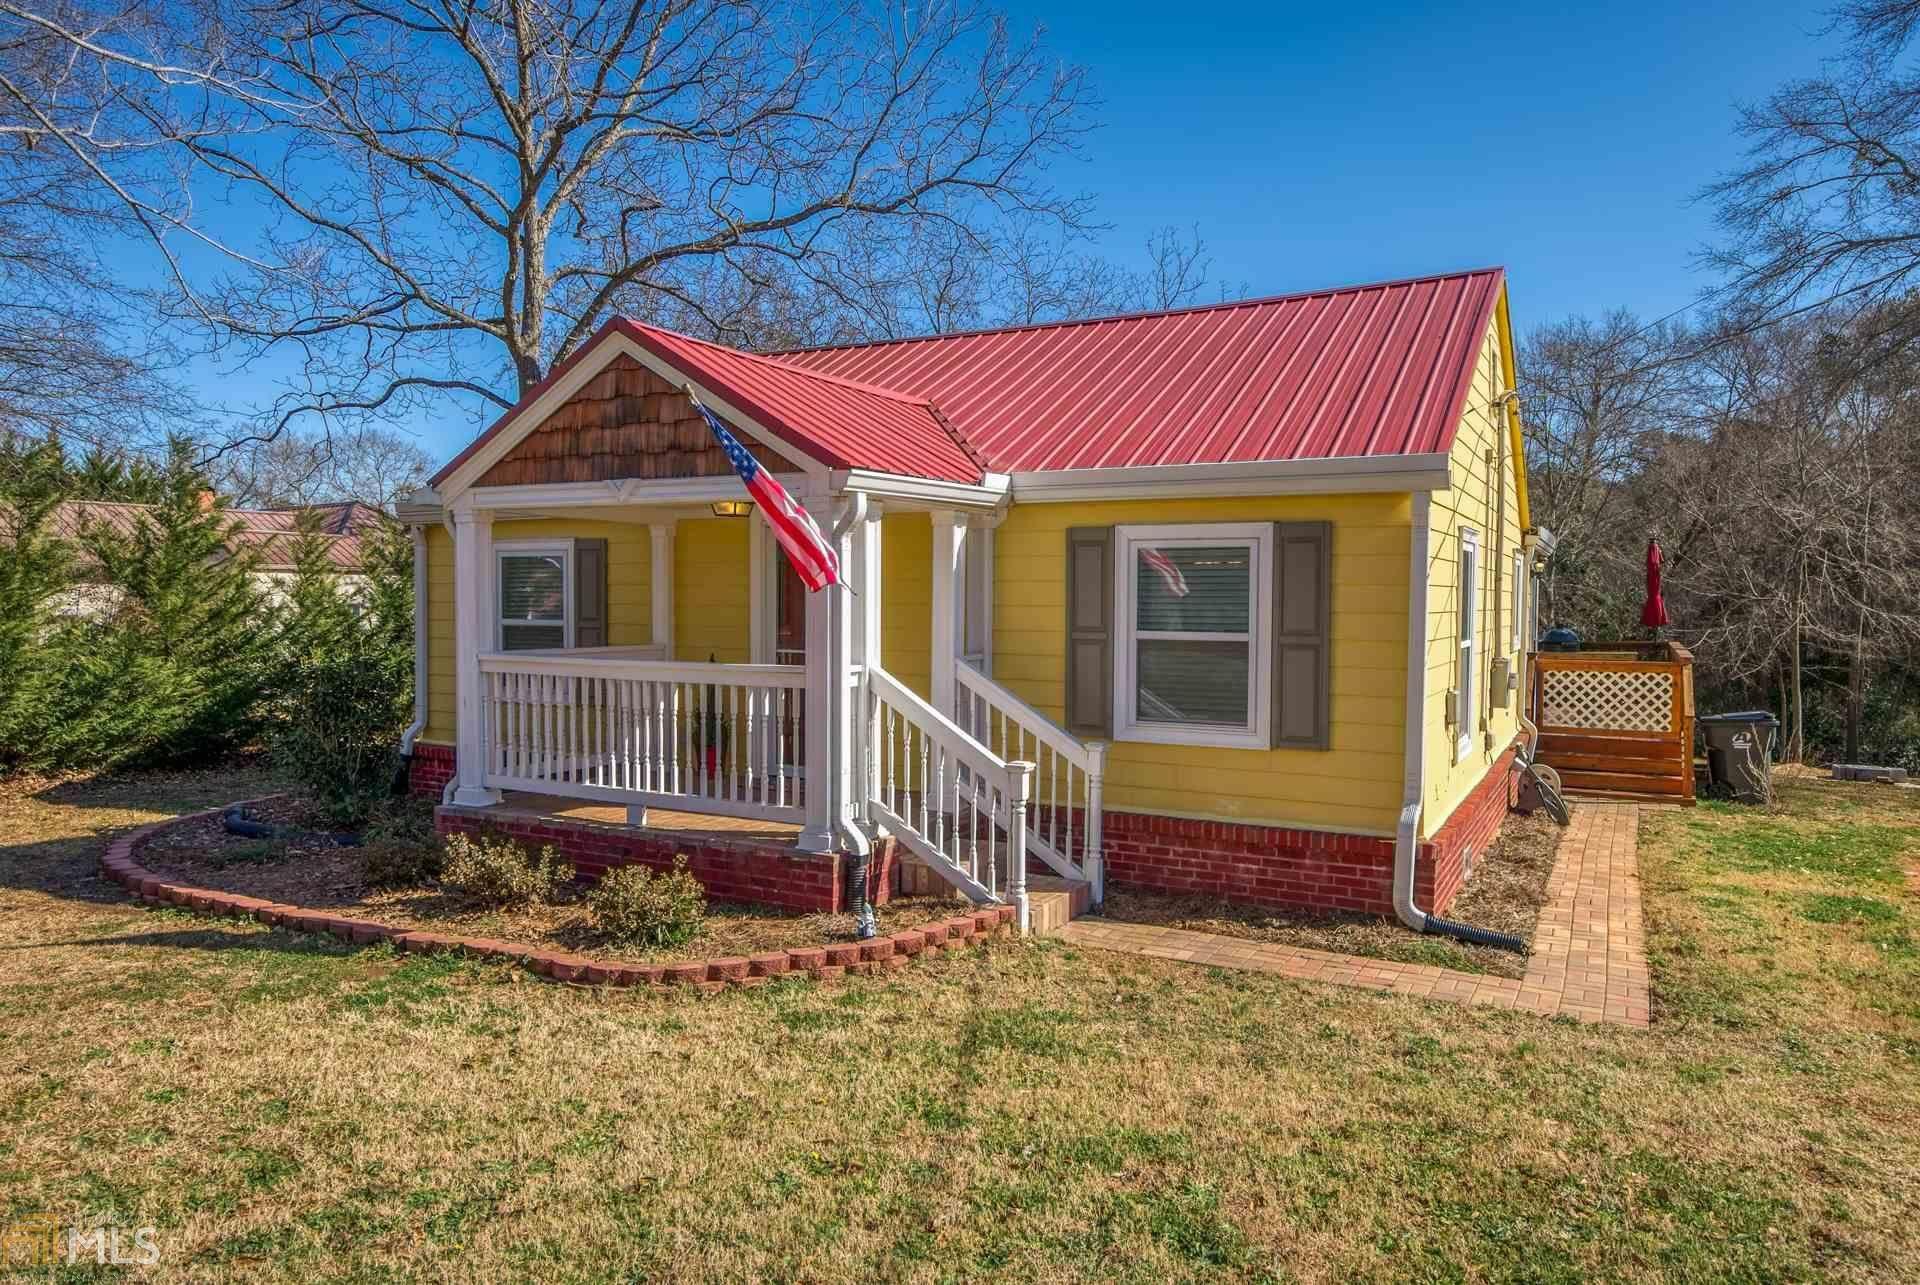 506 S Cherokee Rd, Social Circle, GA 30025 - #: 8917265